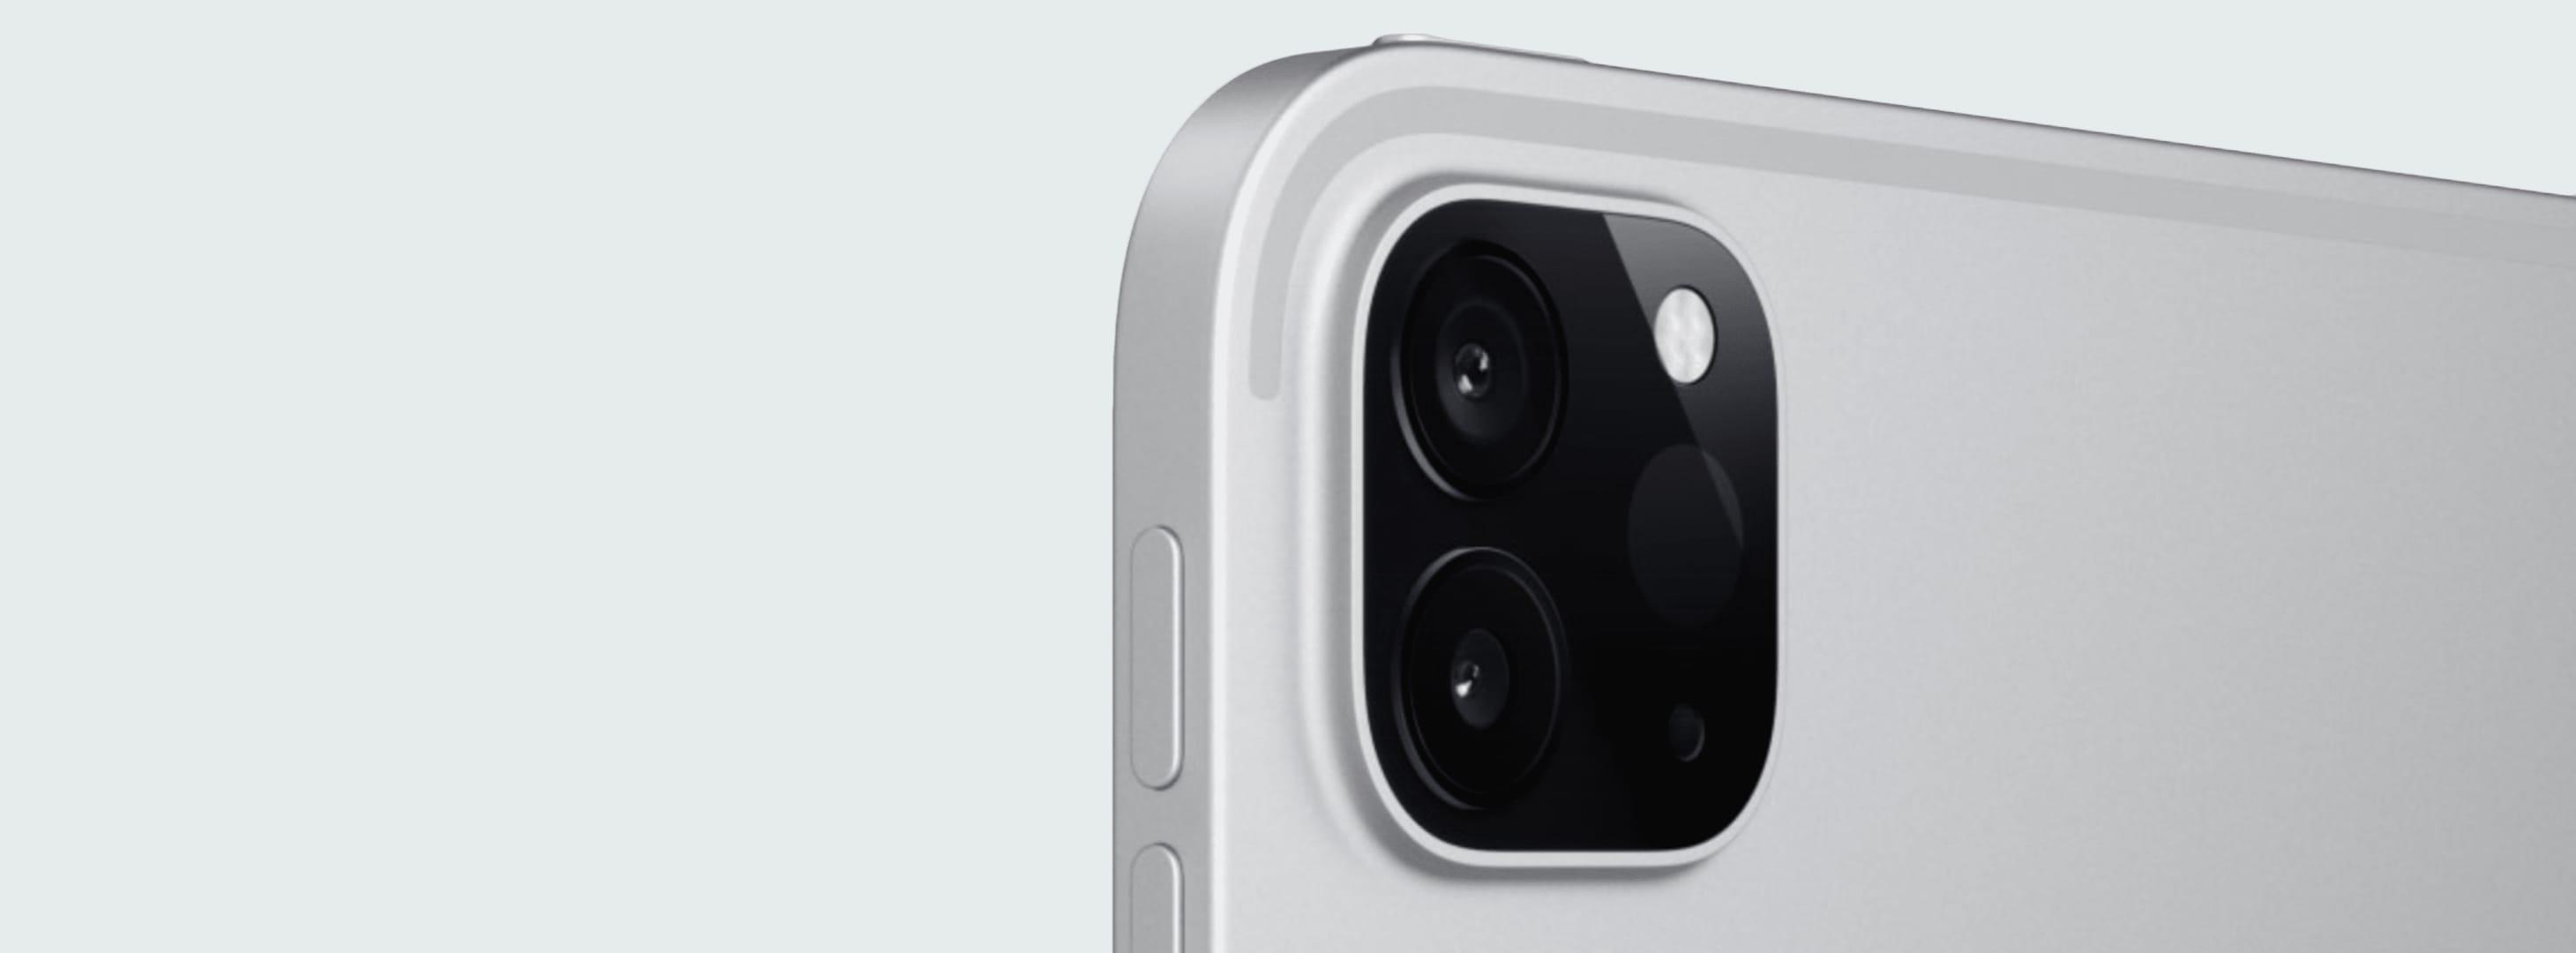 allapplenews-ipad-pro-camera-lidar-scanner